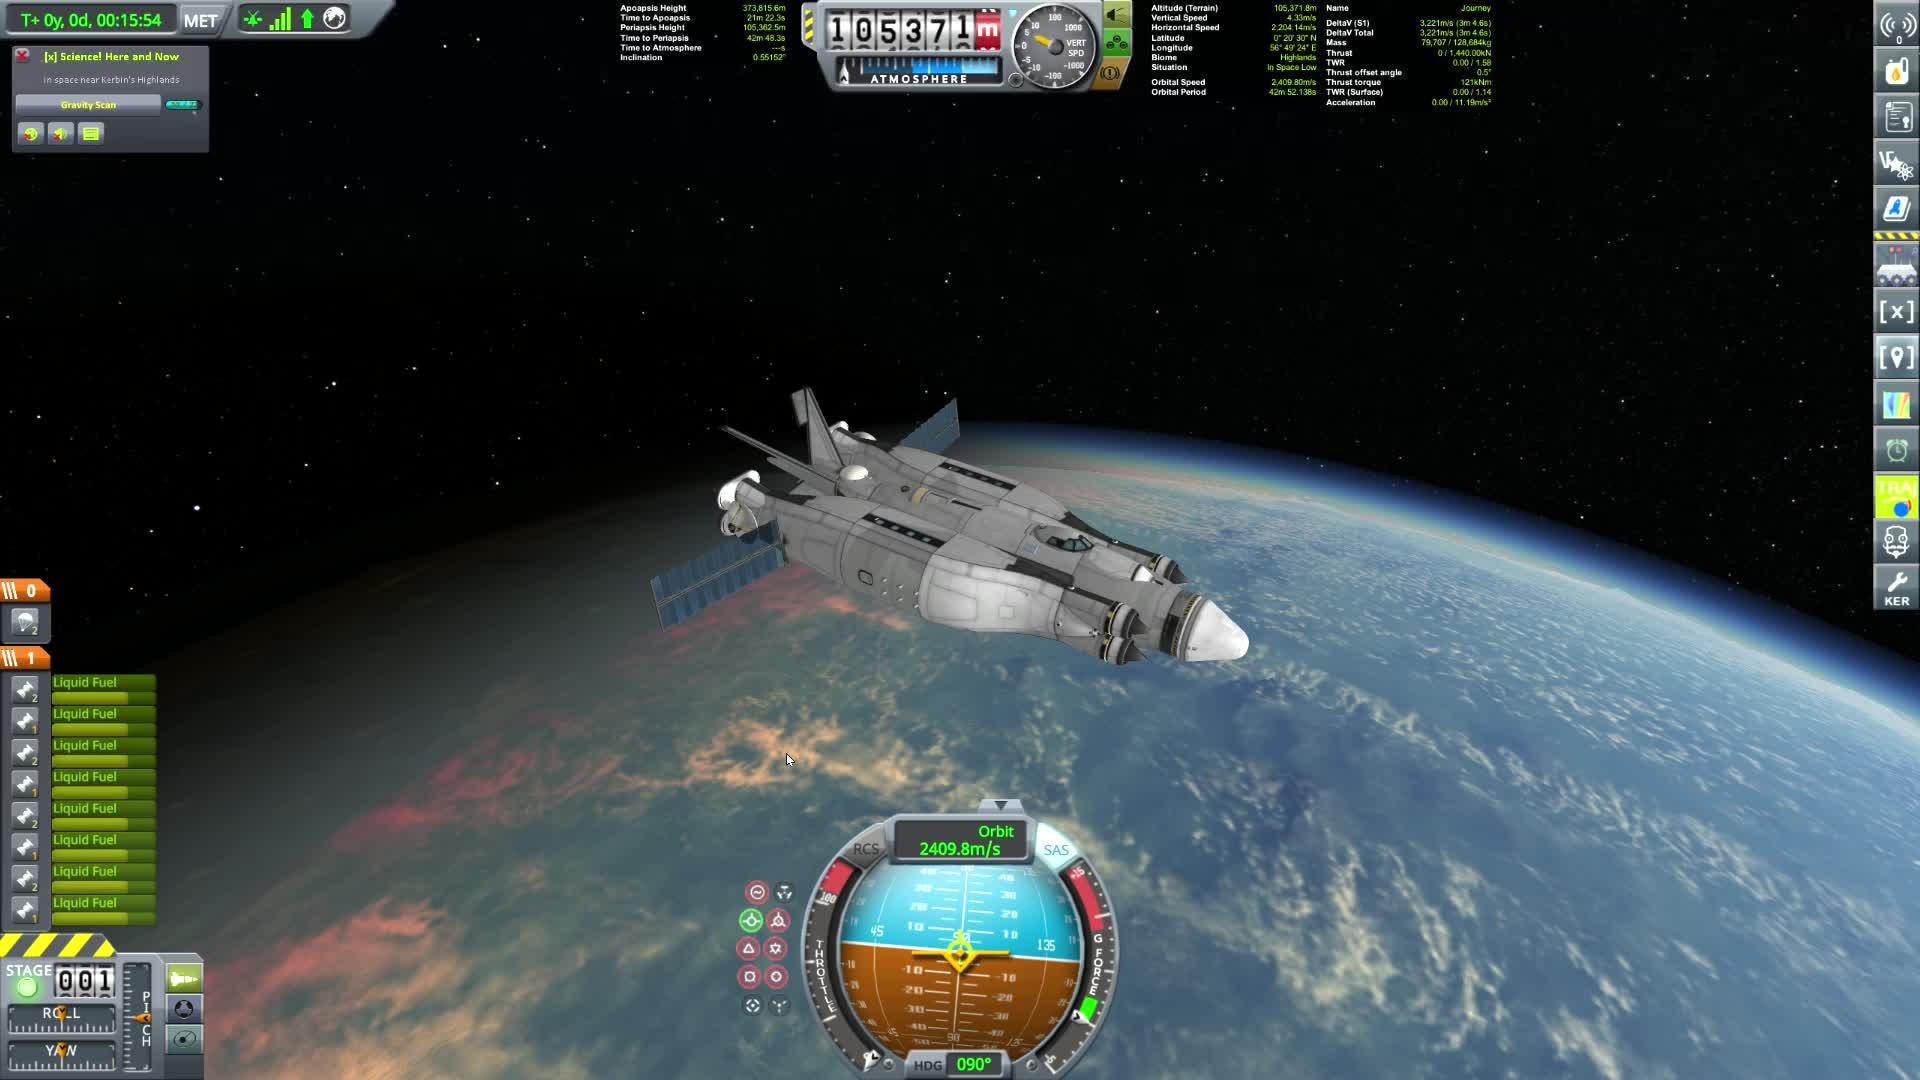 Kerbal Space Program GIFs